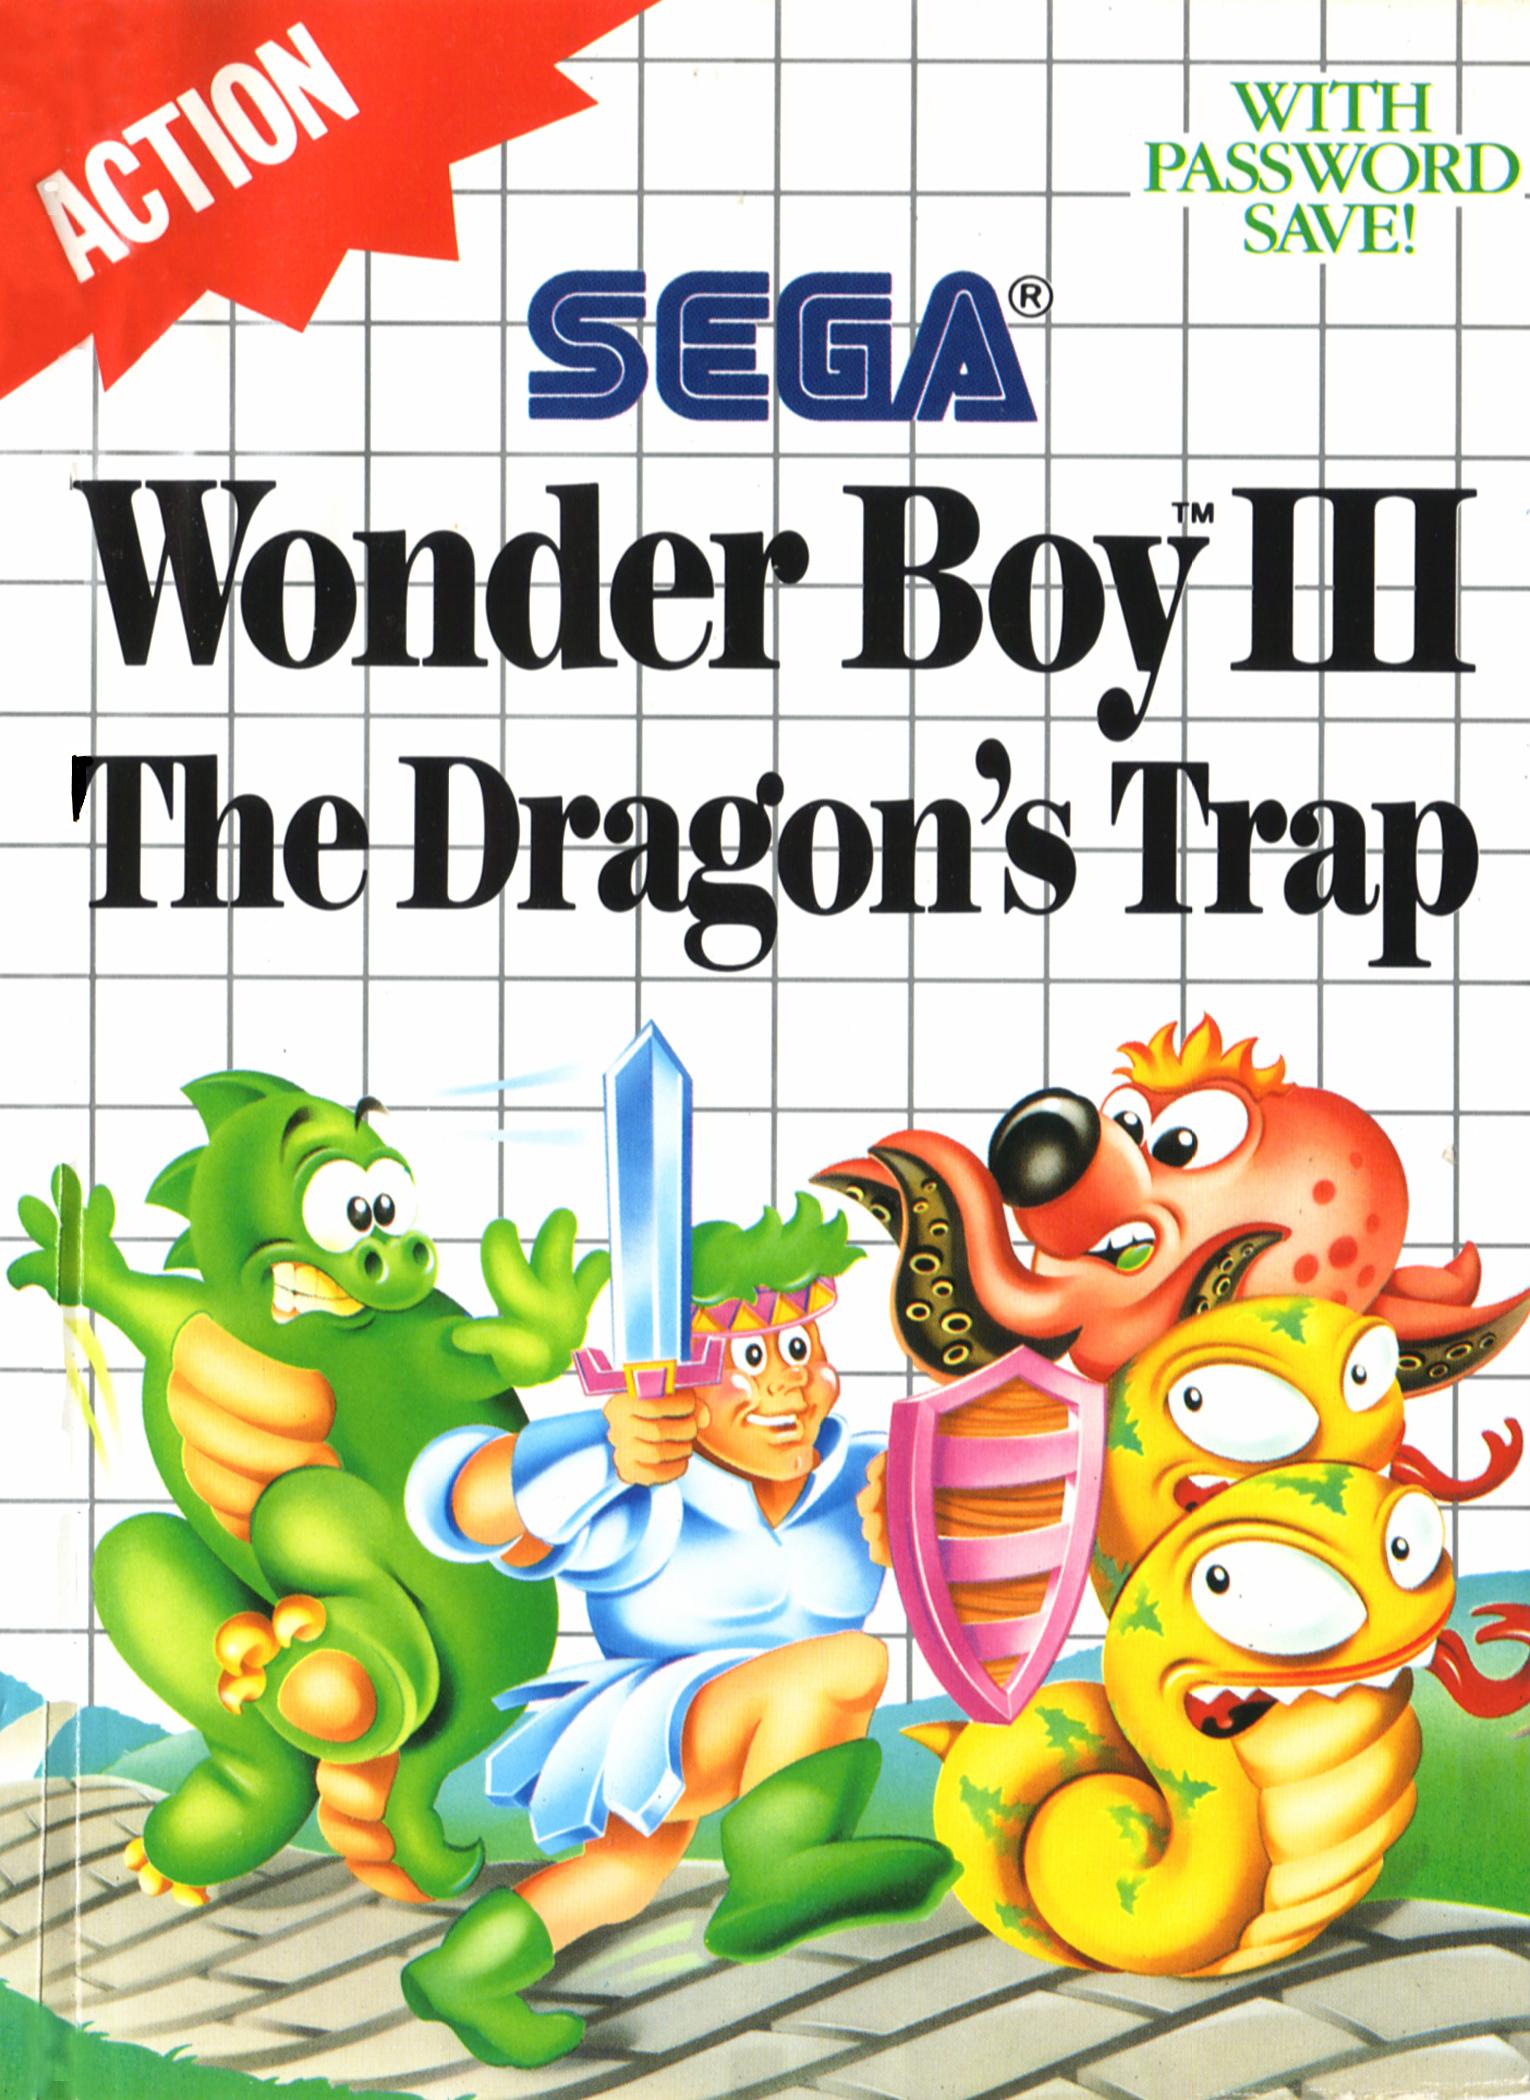 Wonder Boy III The Dragon's Trap/Sega Master